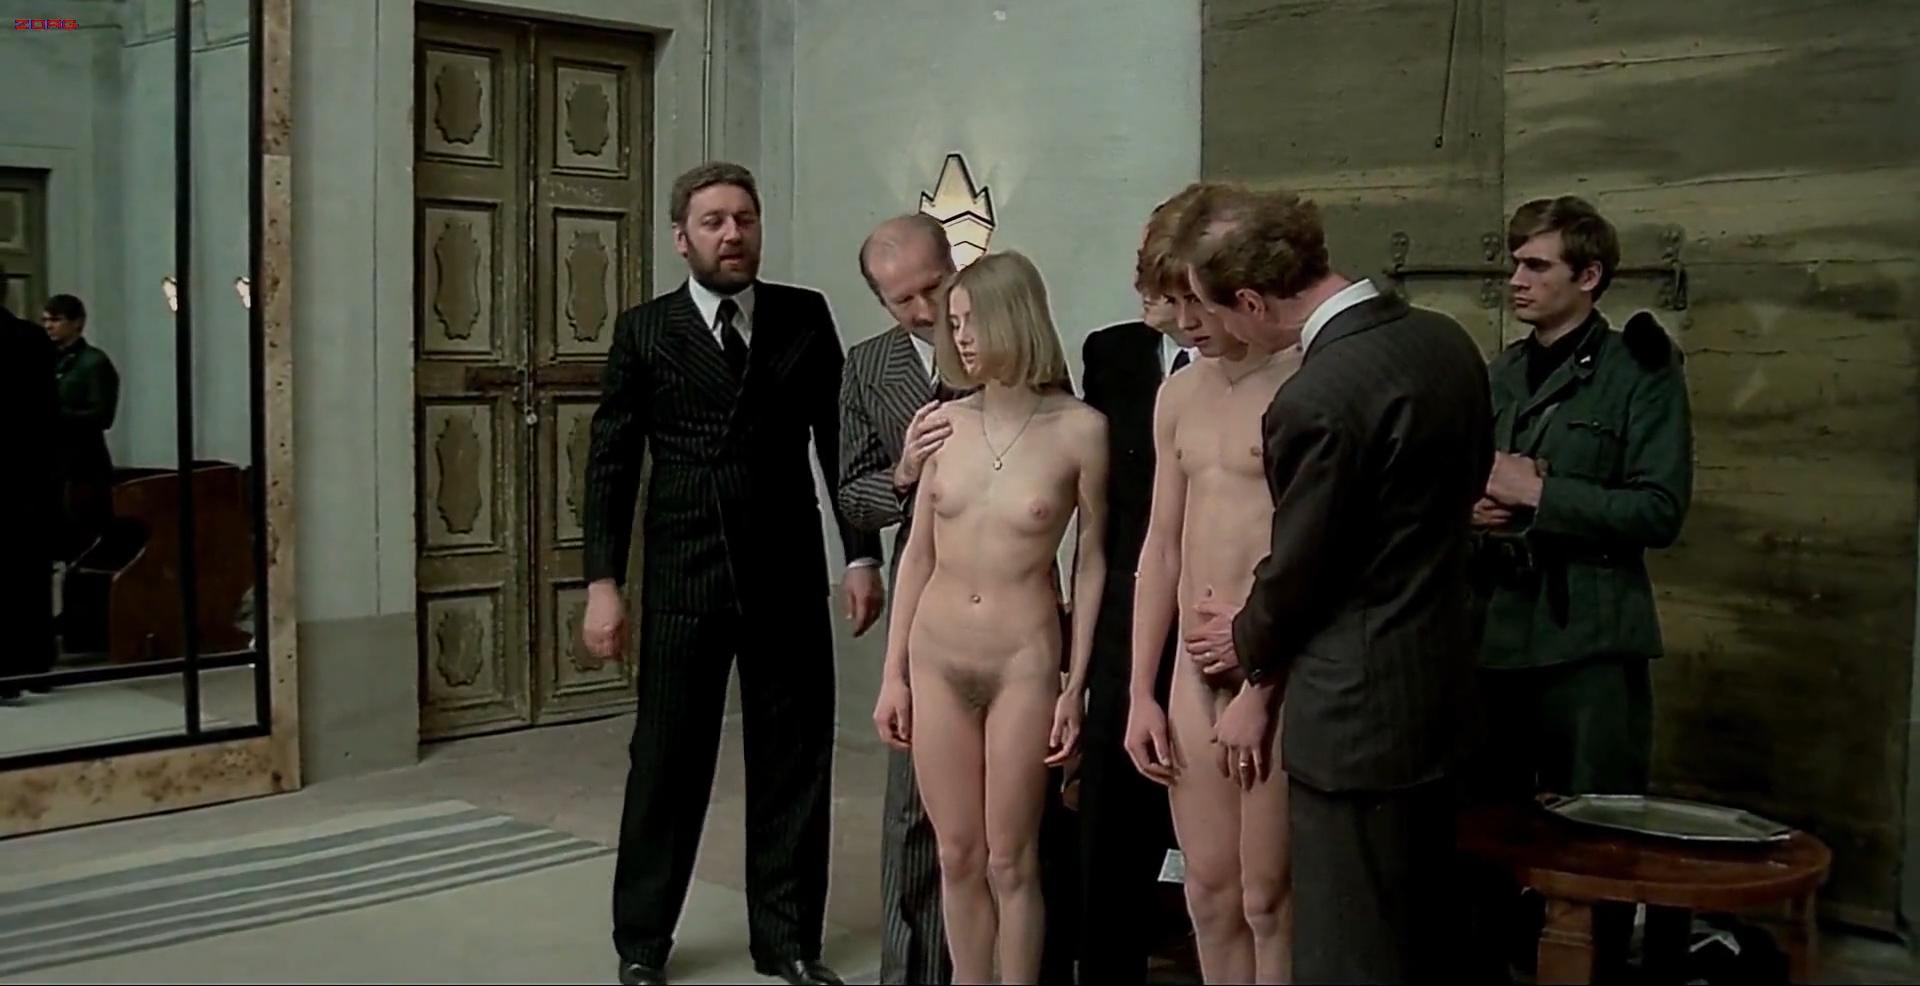 Renata Moar nude full frontal - Salo - 120 Days of Sodom (1975) hd1080p (1)